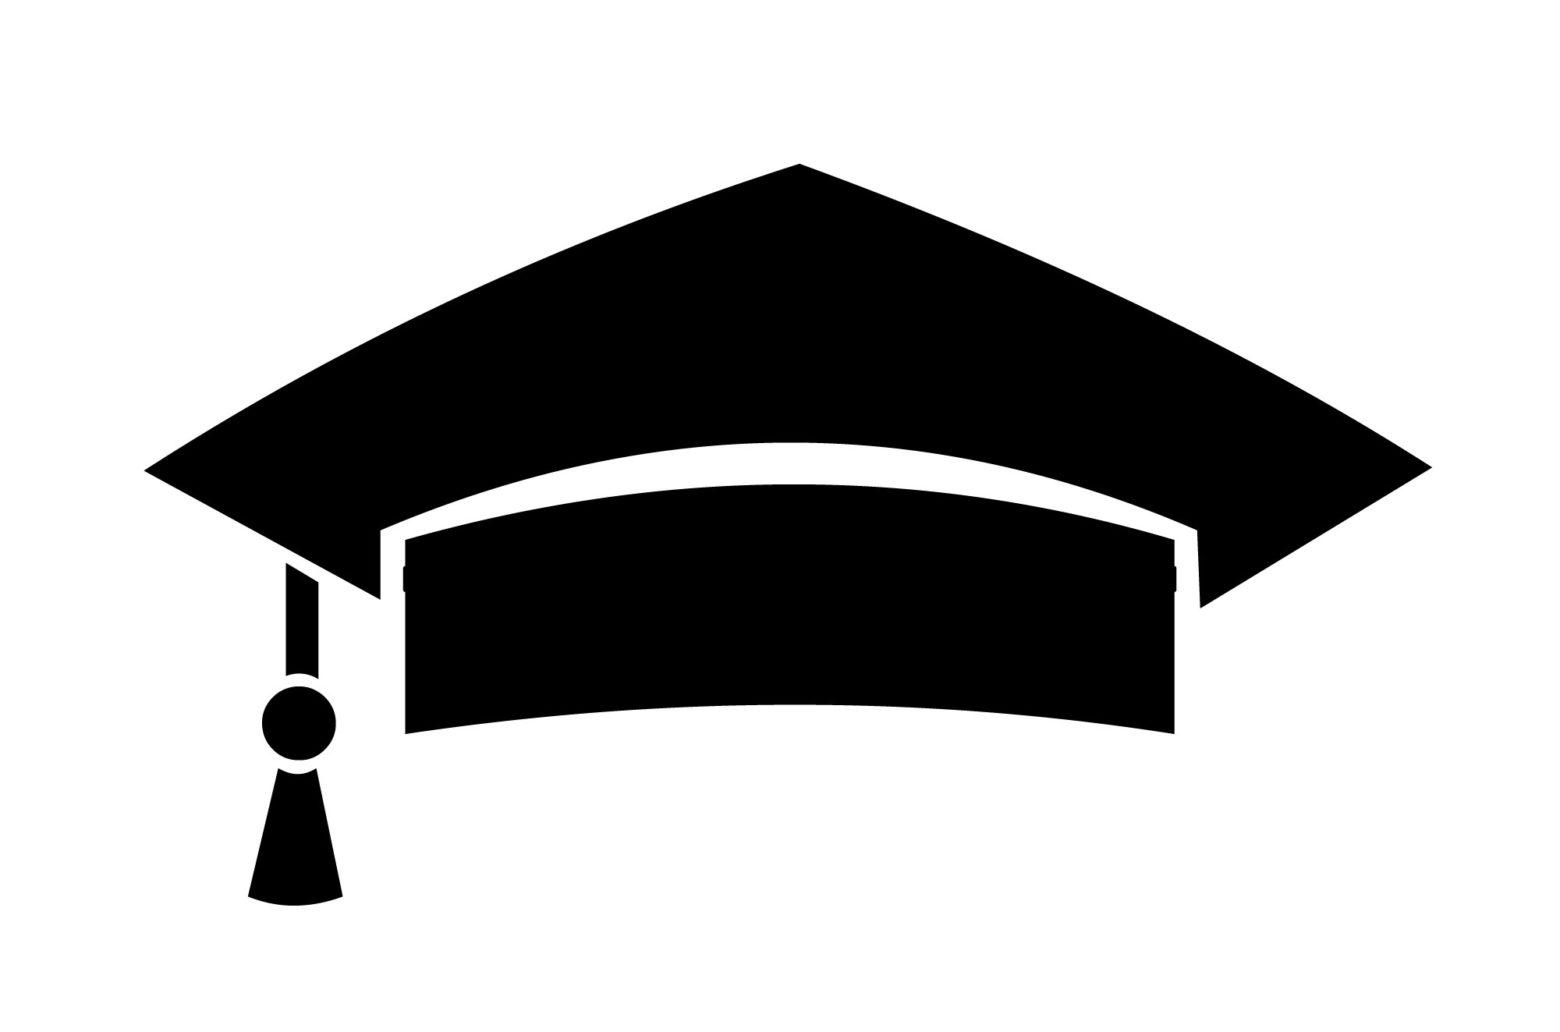 Education hat graduation cap icon.